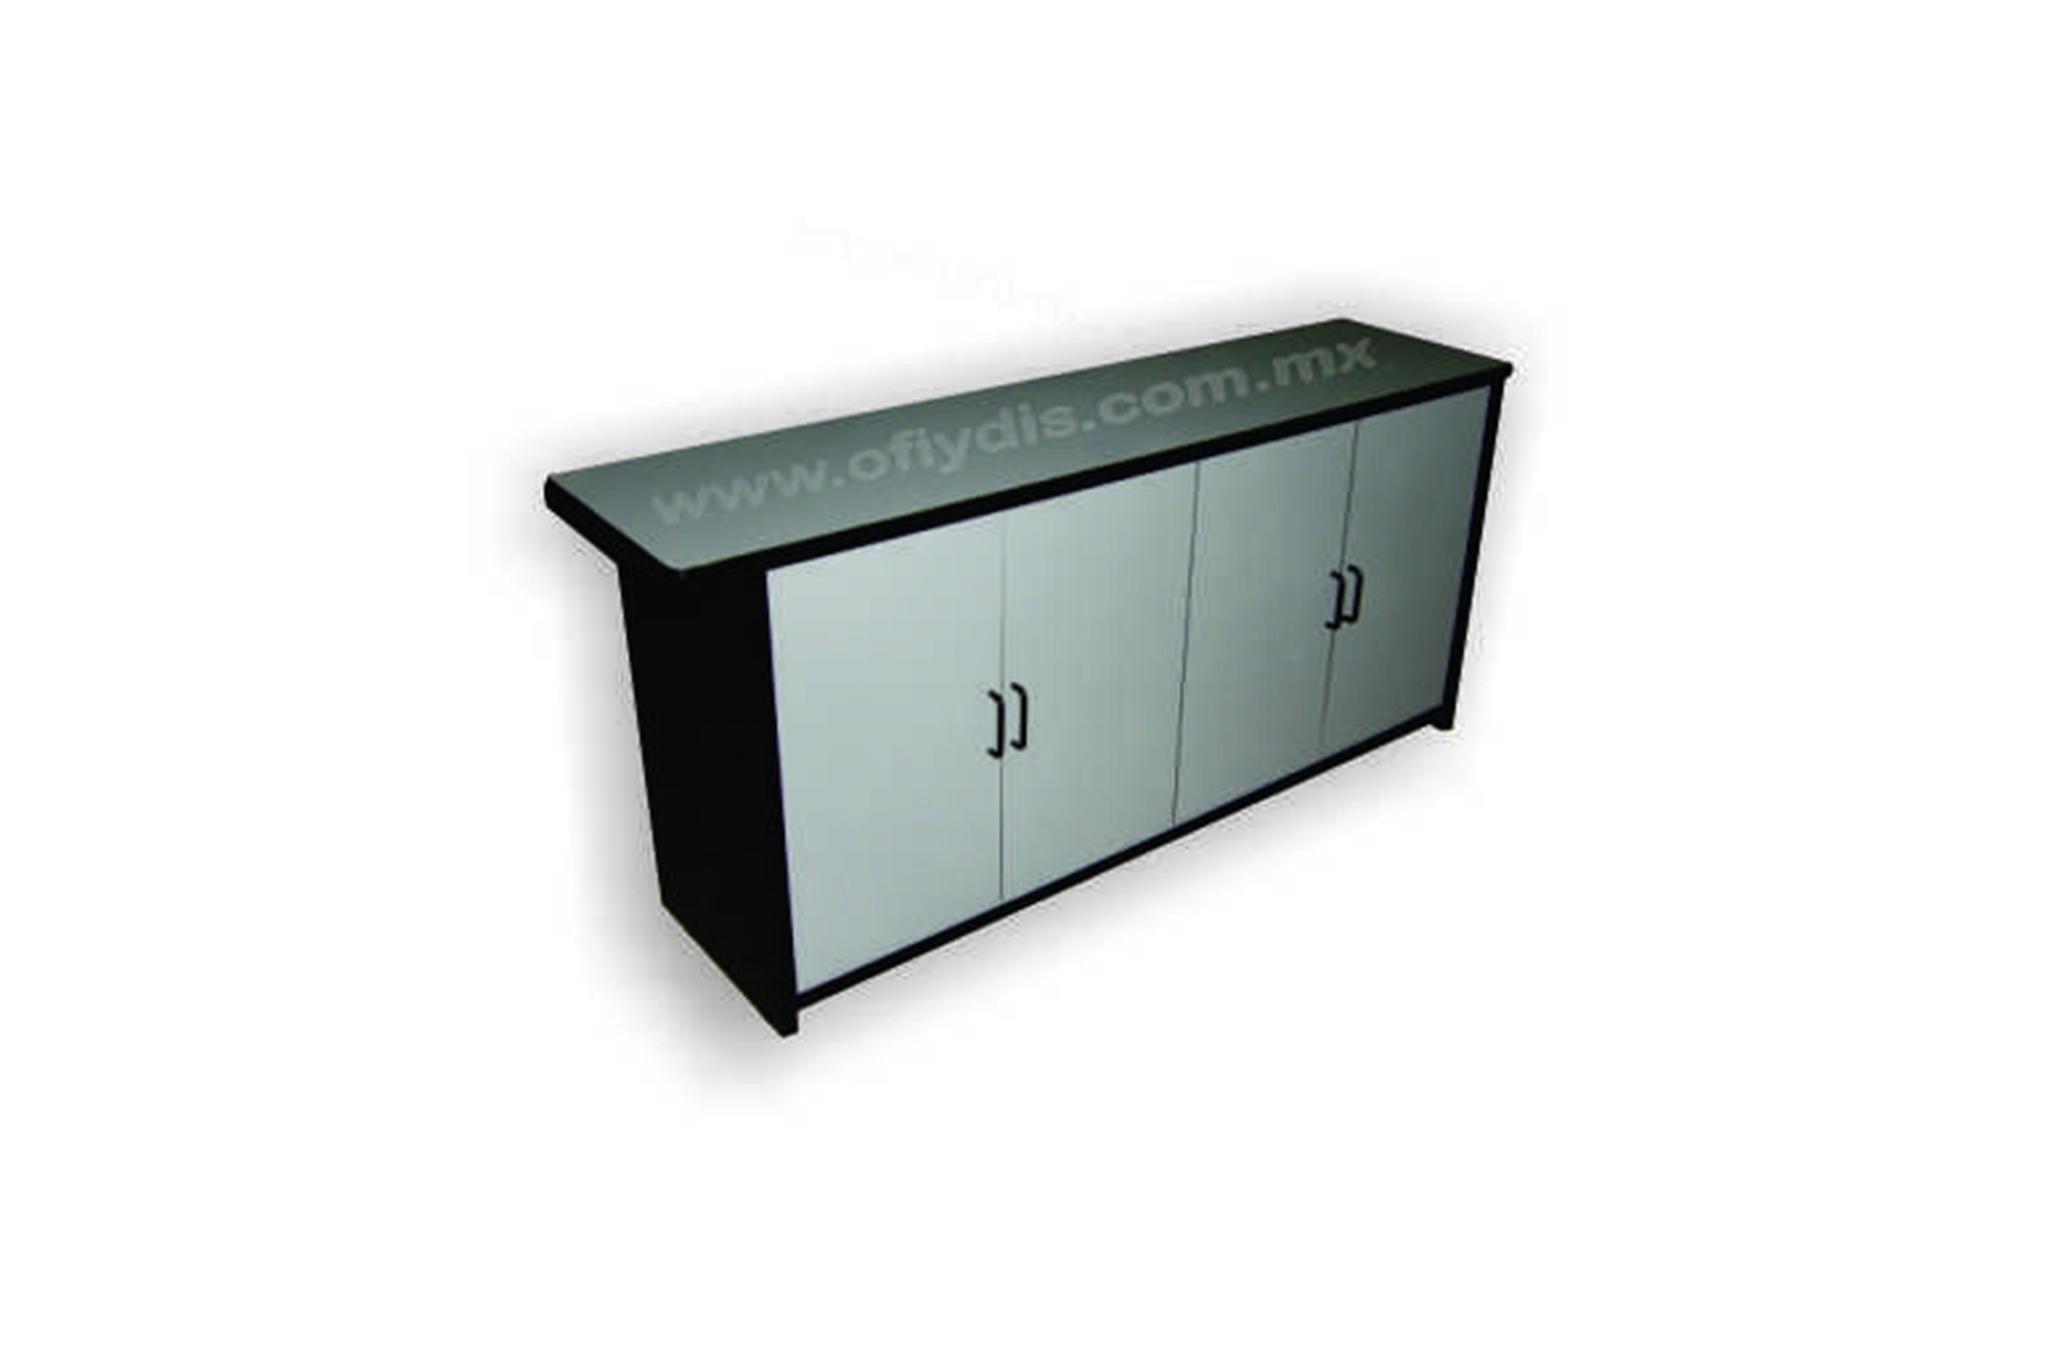 Credenza Con Puertas : Credenza con puertas corredizas ofiydis muebles para oficina